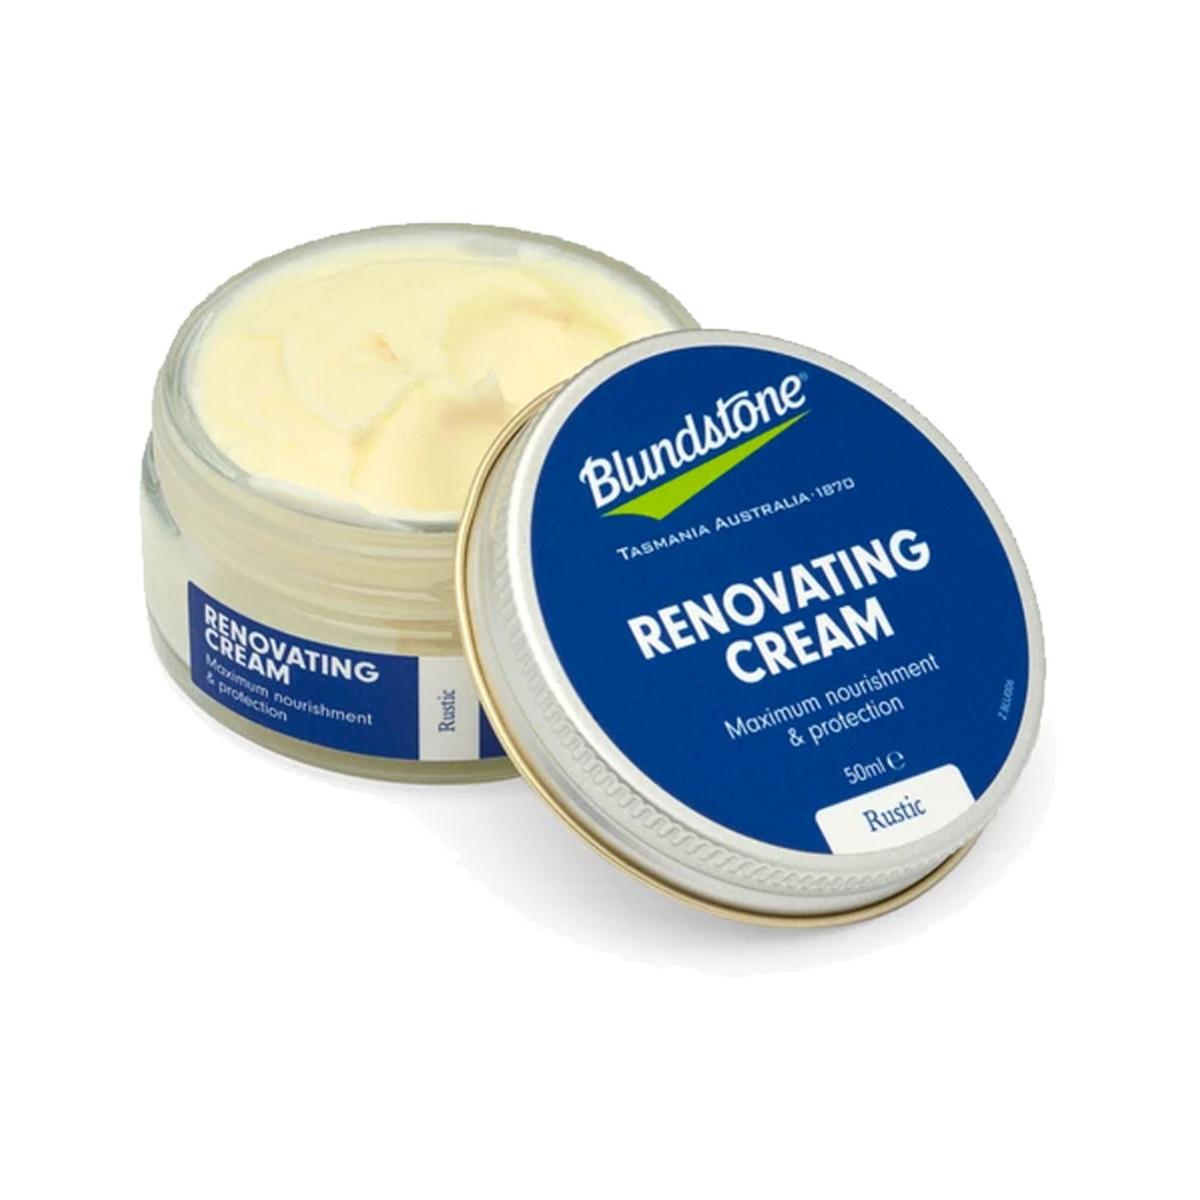 Blundstone Renovation Cream Rustic Brown